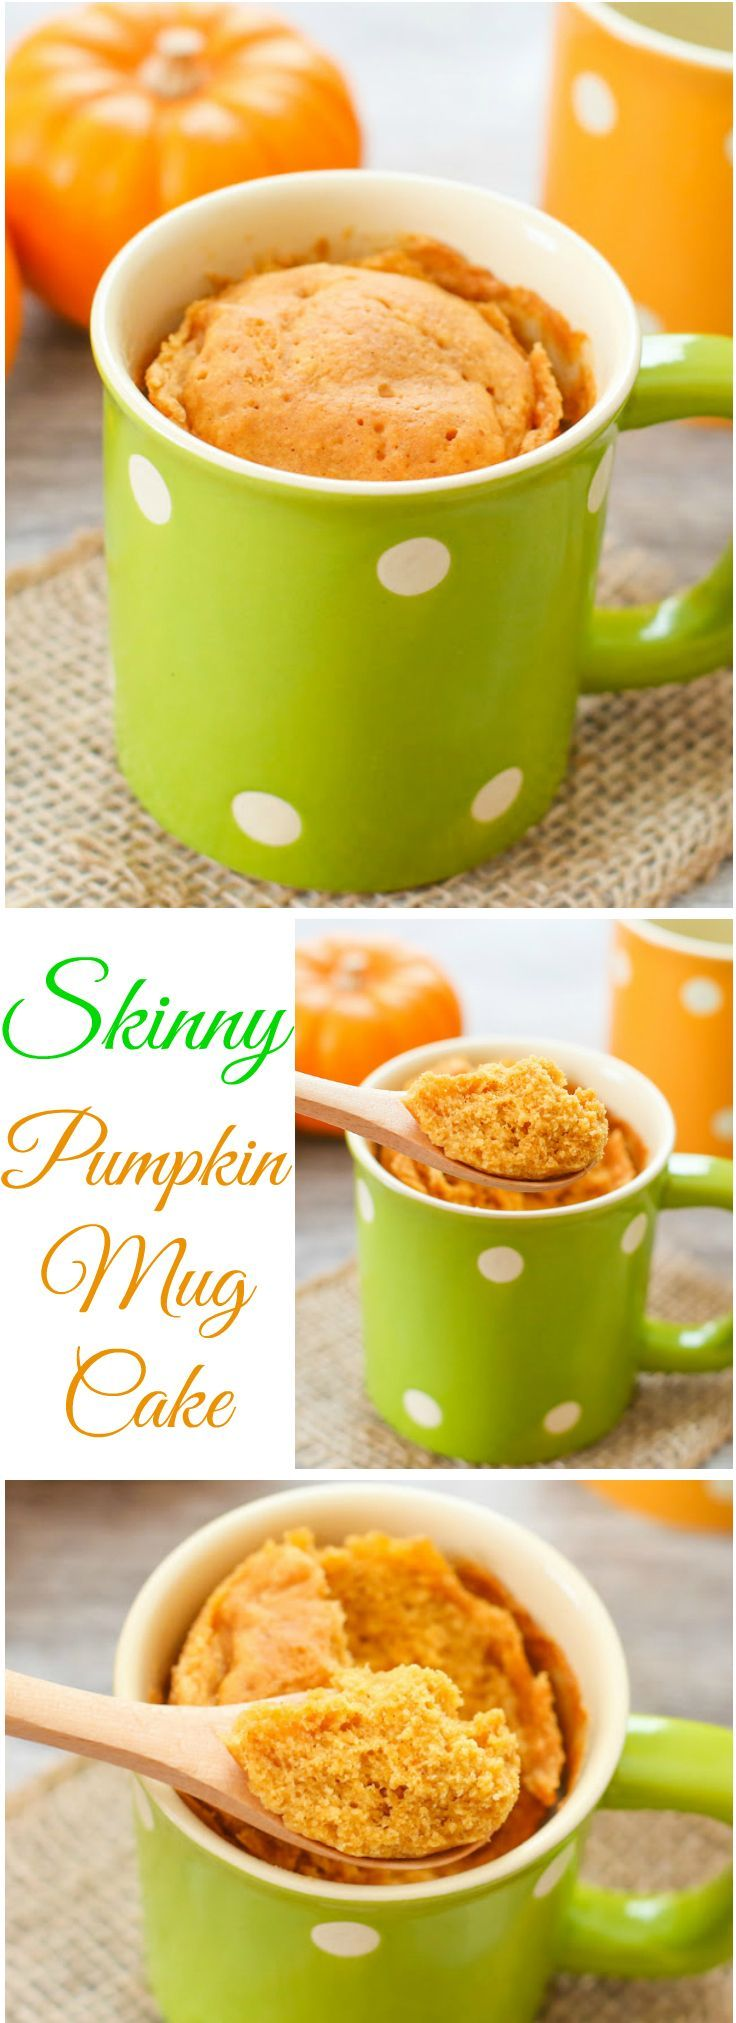 Skinny Pumpkin Mug Cake. Only 190 calories! --------> http://tipsalud.com